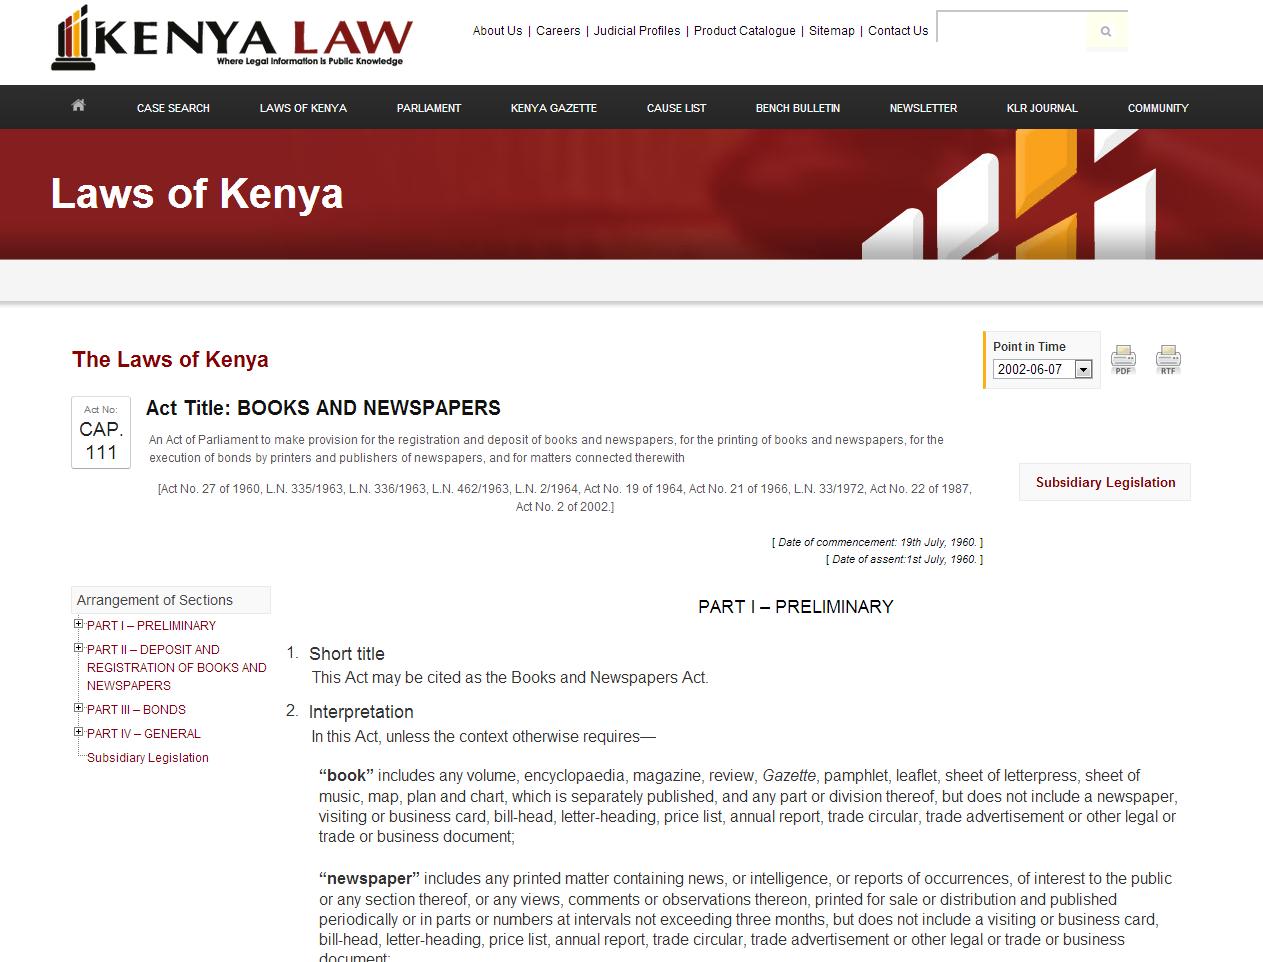 The Laws of Kenya